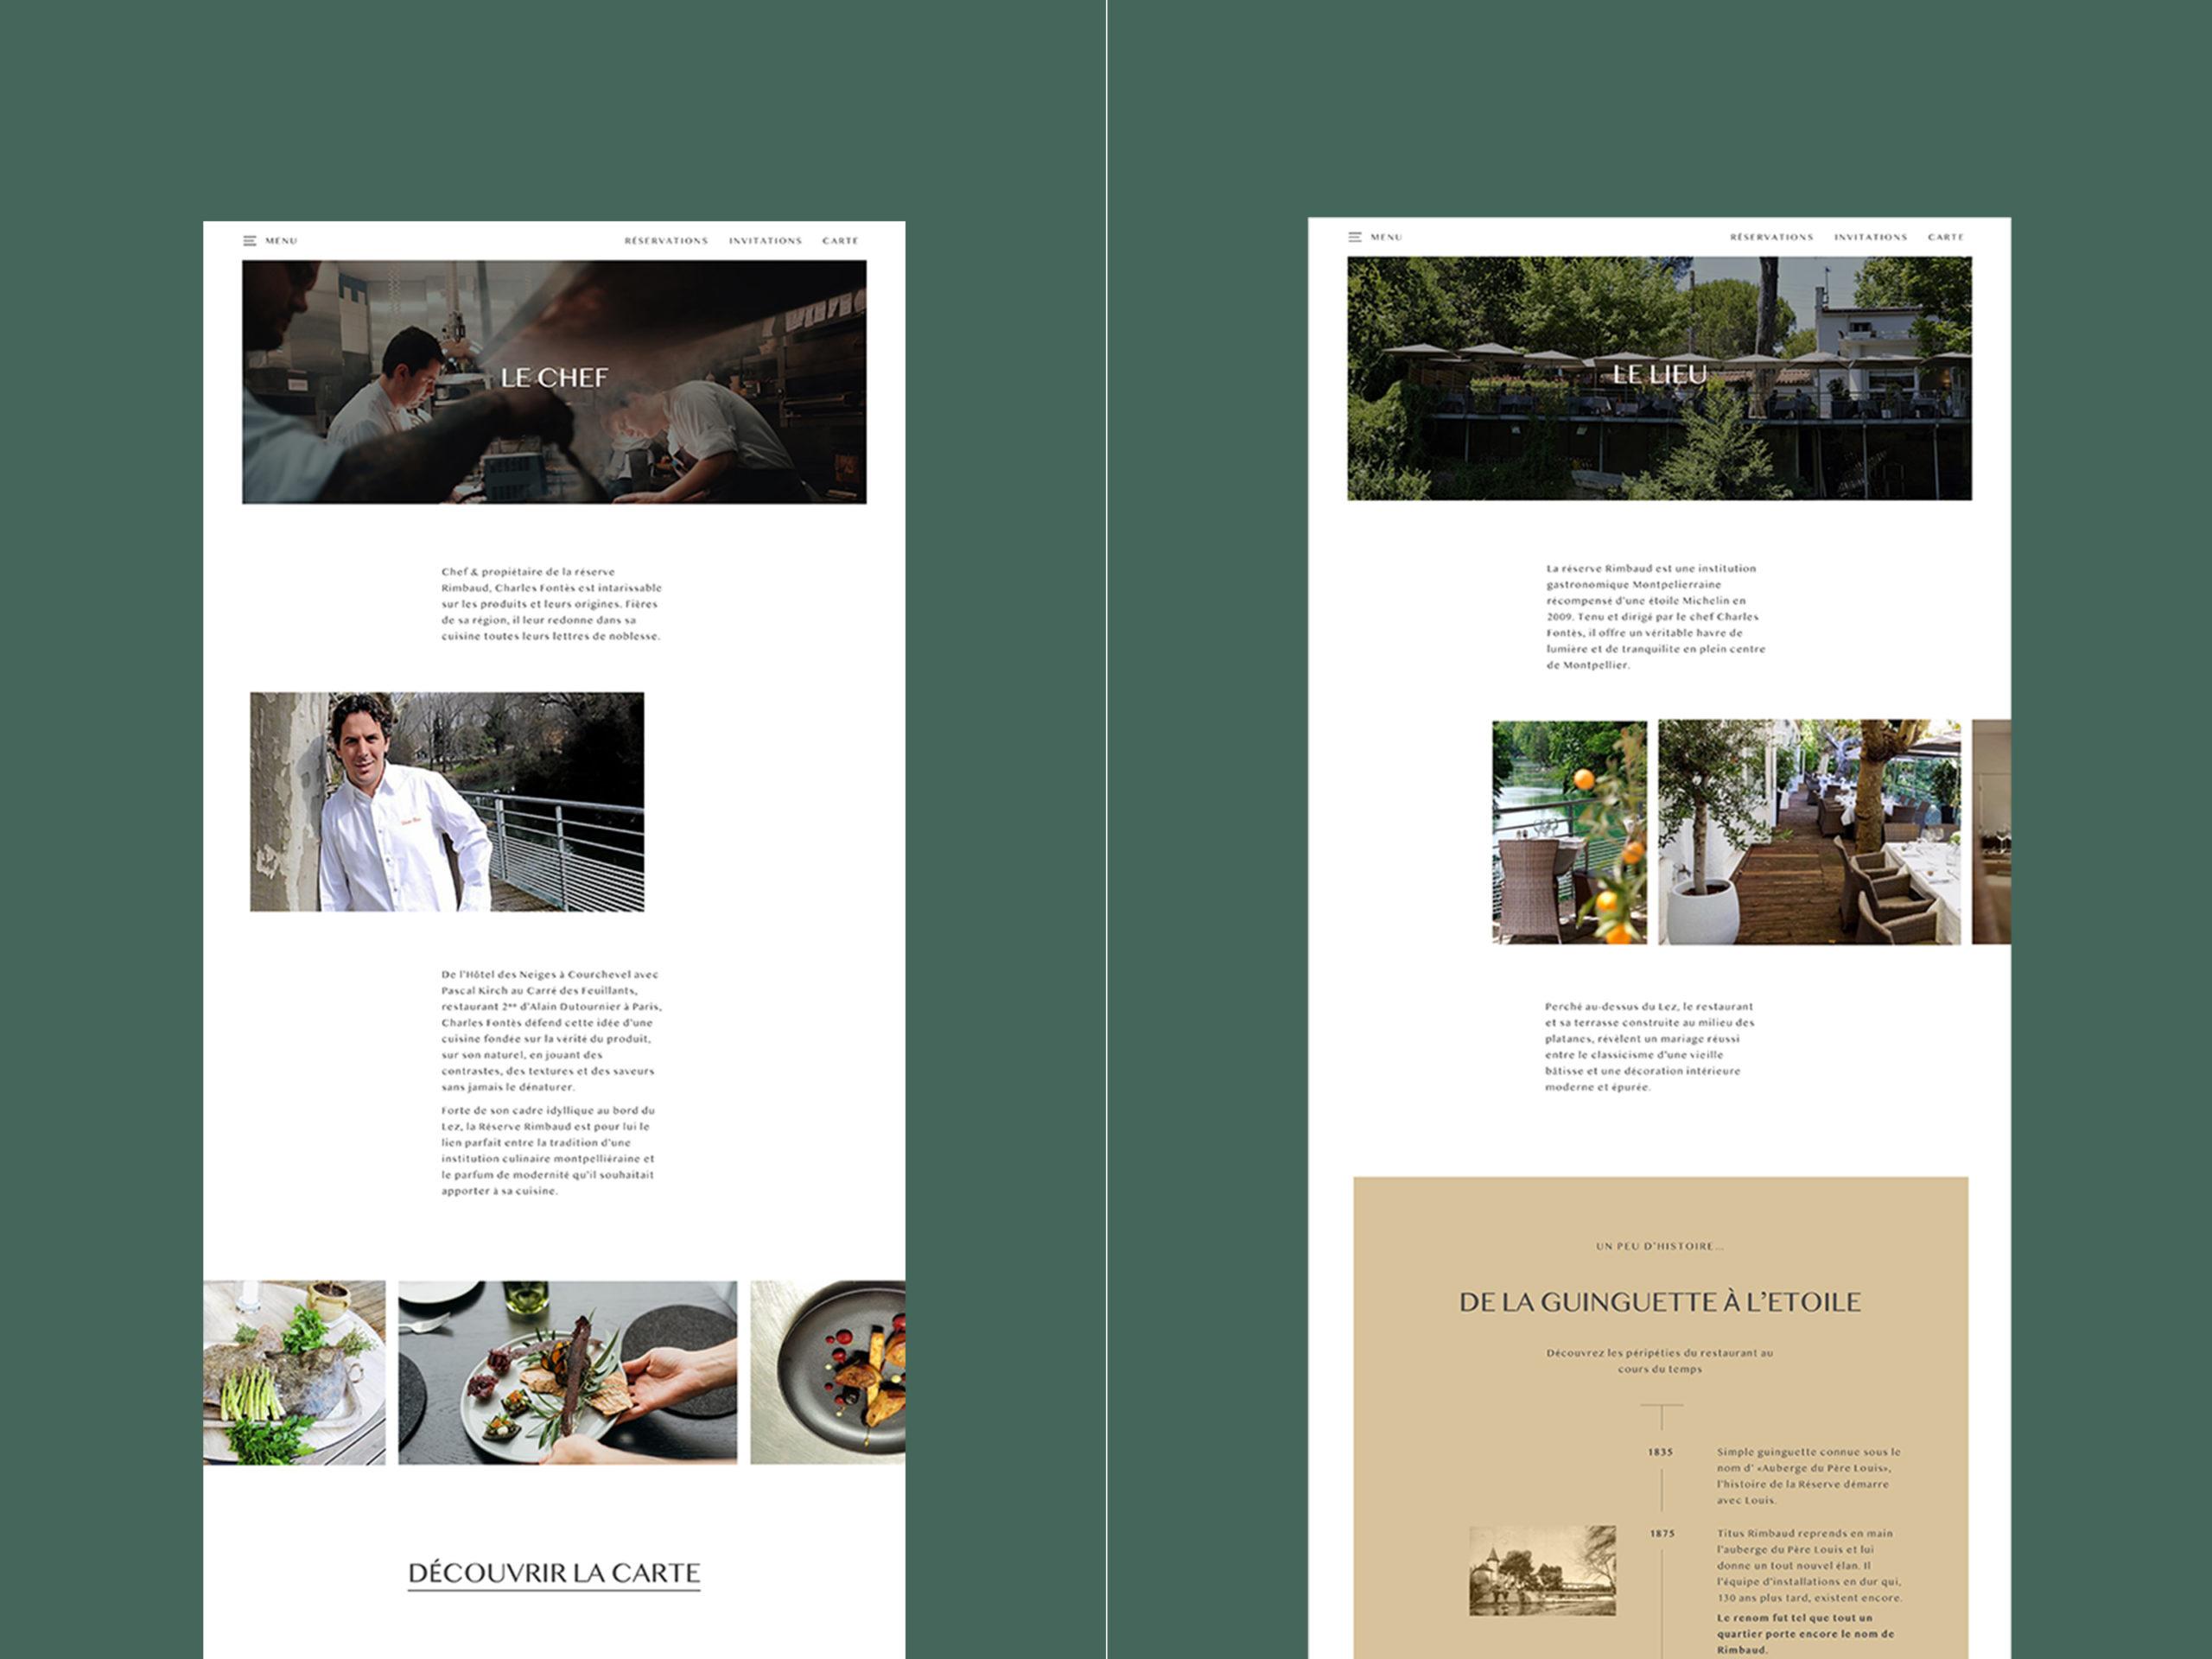 RR-05_Michelin-star-restaurant-Ui@2x